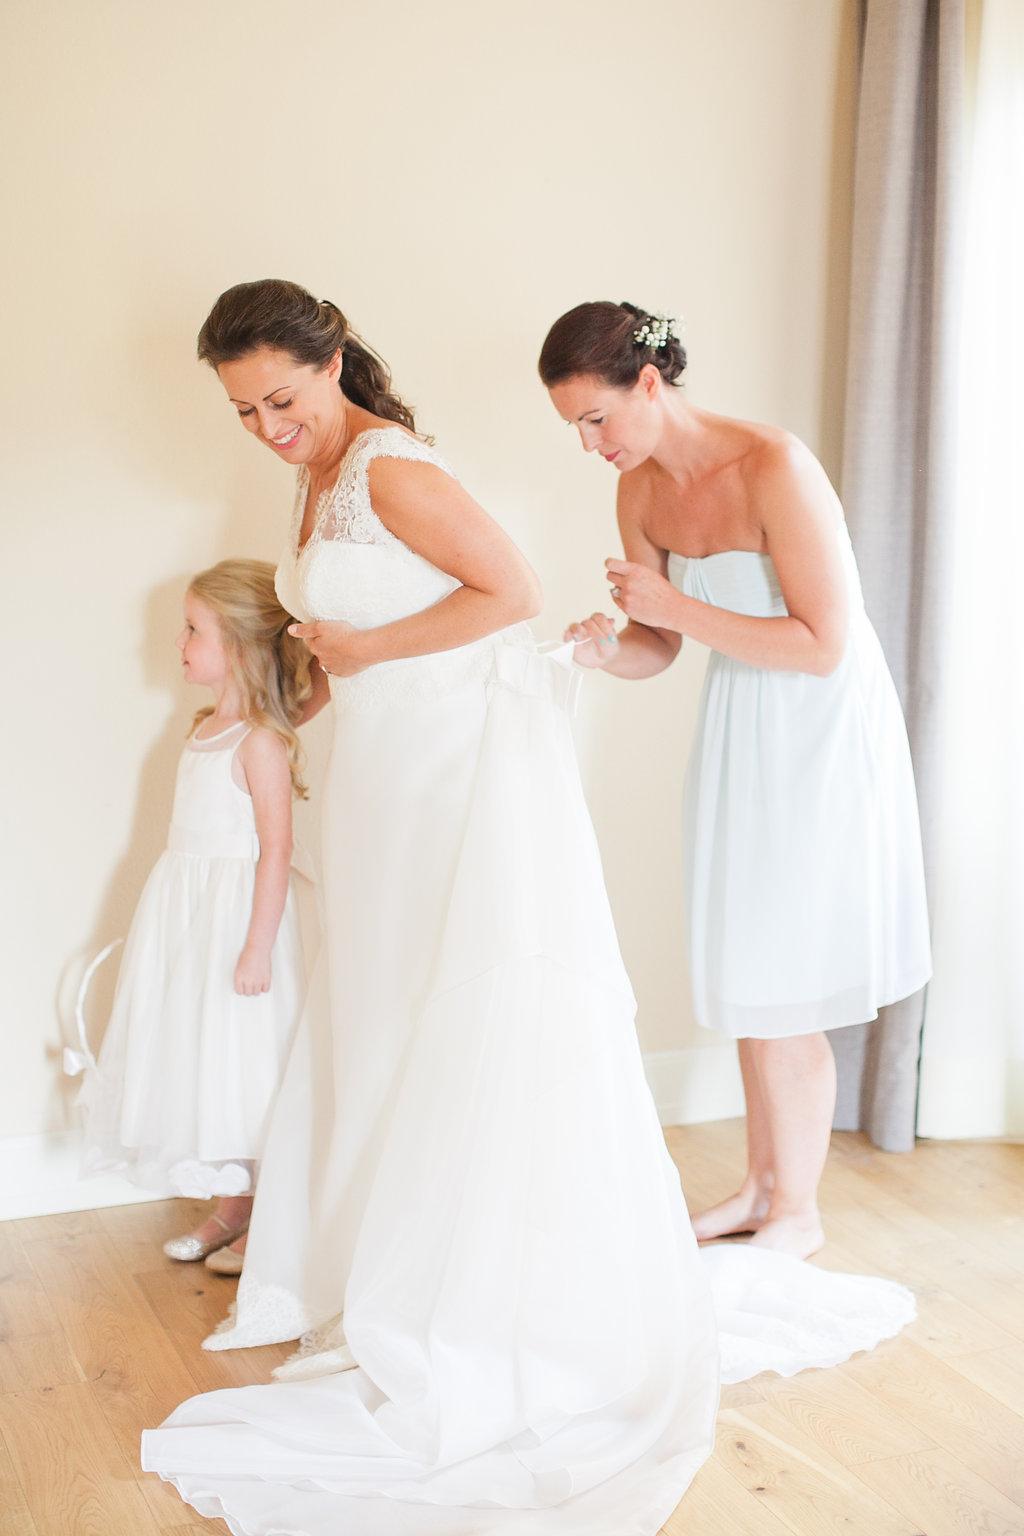 castelfalfi-tuscany-wedding-photographer-roberta-facchini-76